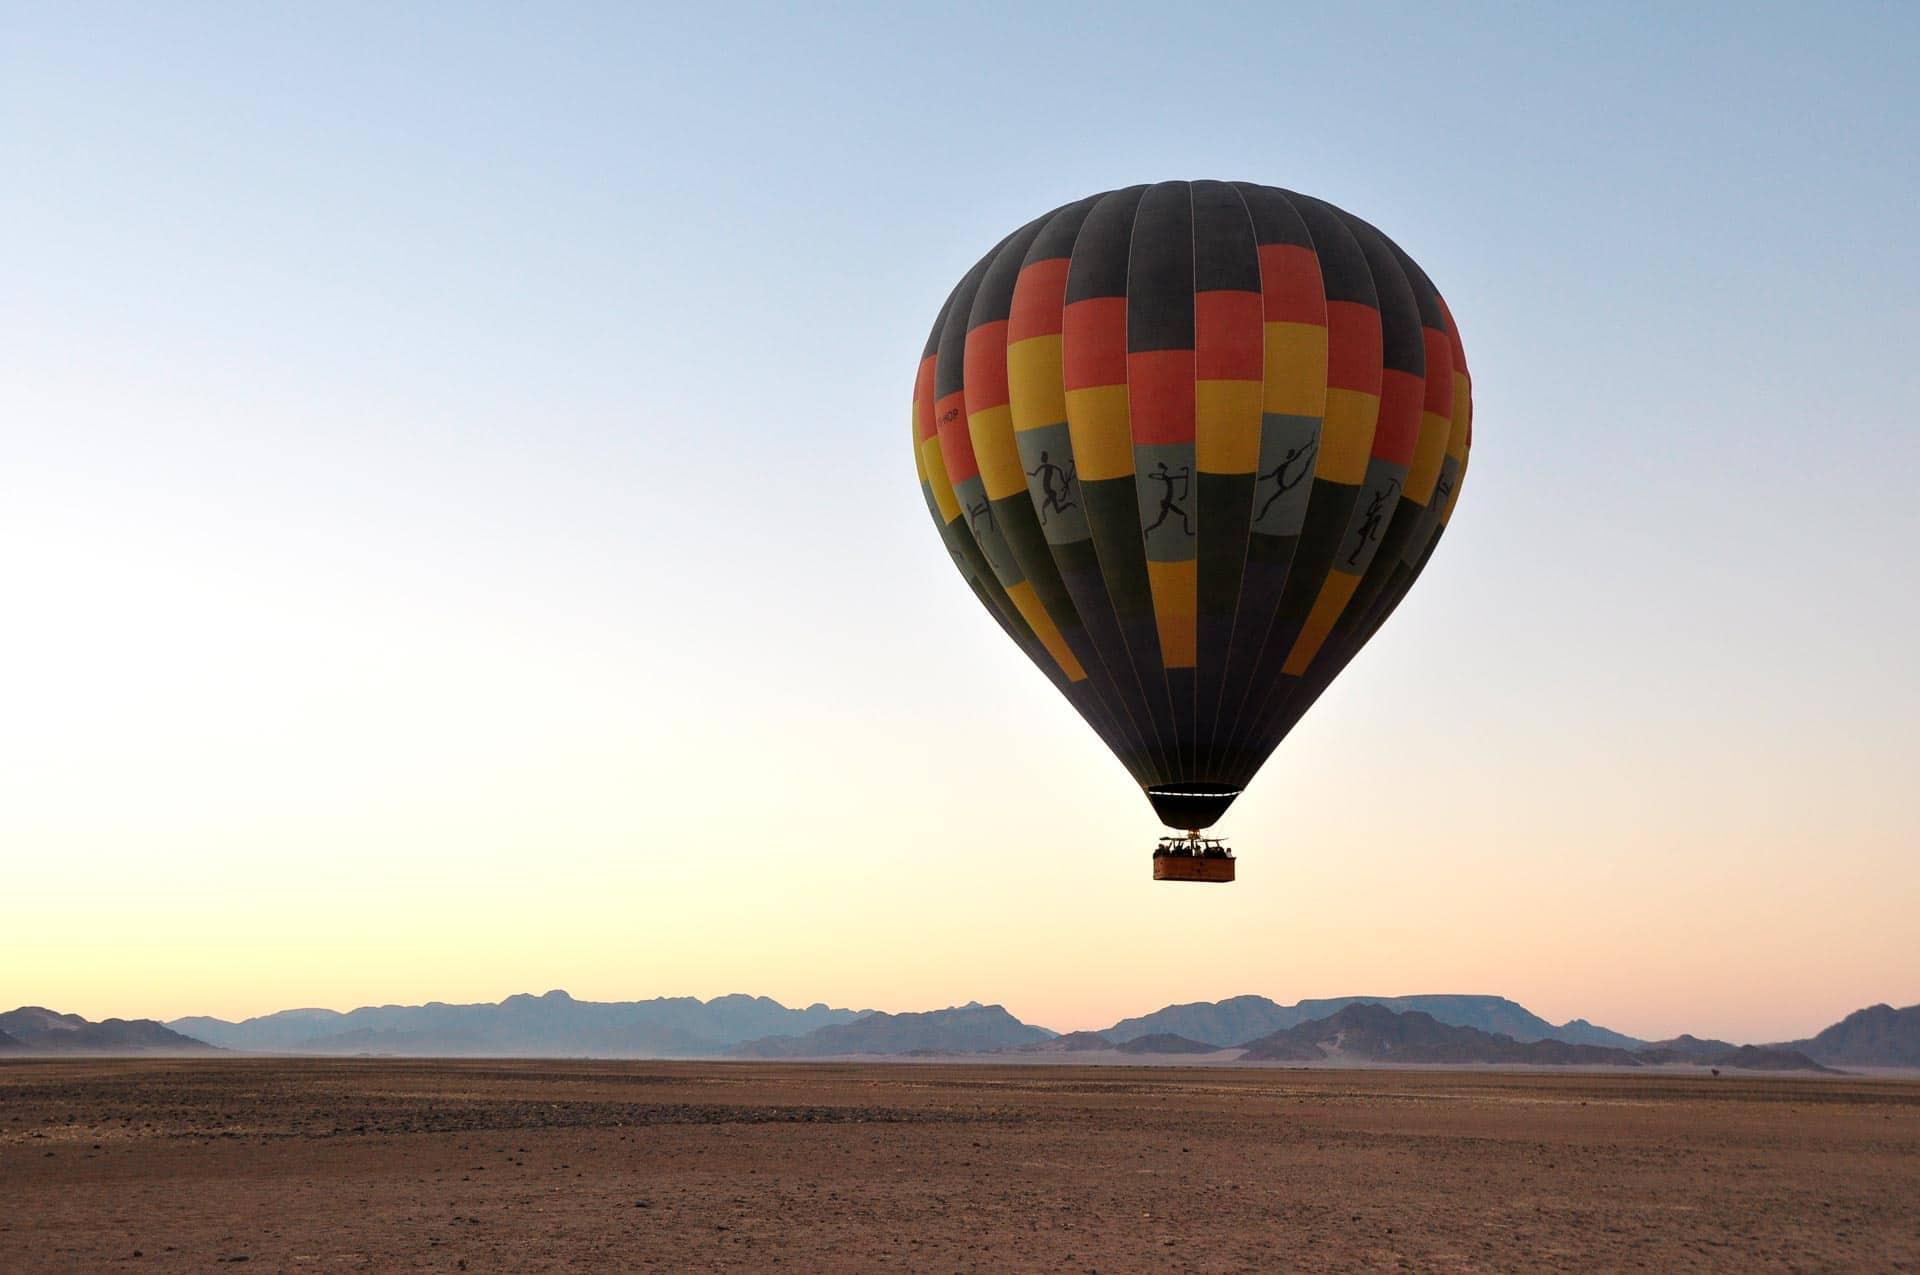 Namib-Ballonfahrt-Wueste-Namibia-Globetrotter-Select-9